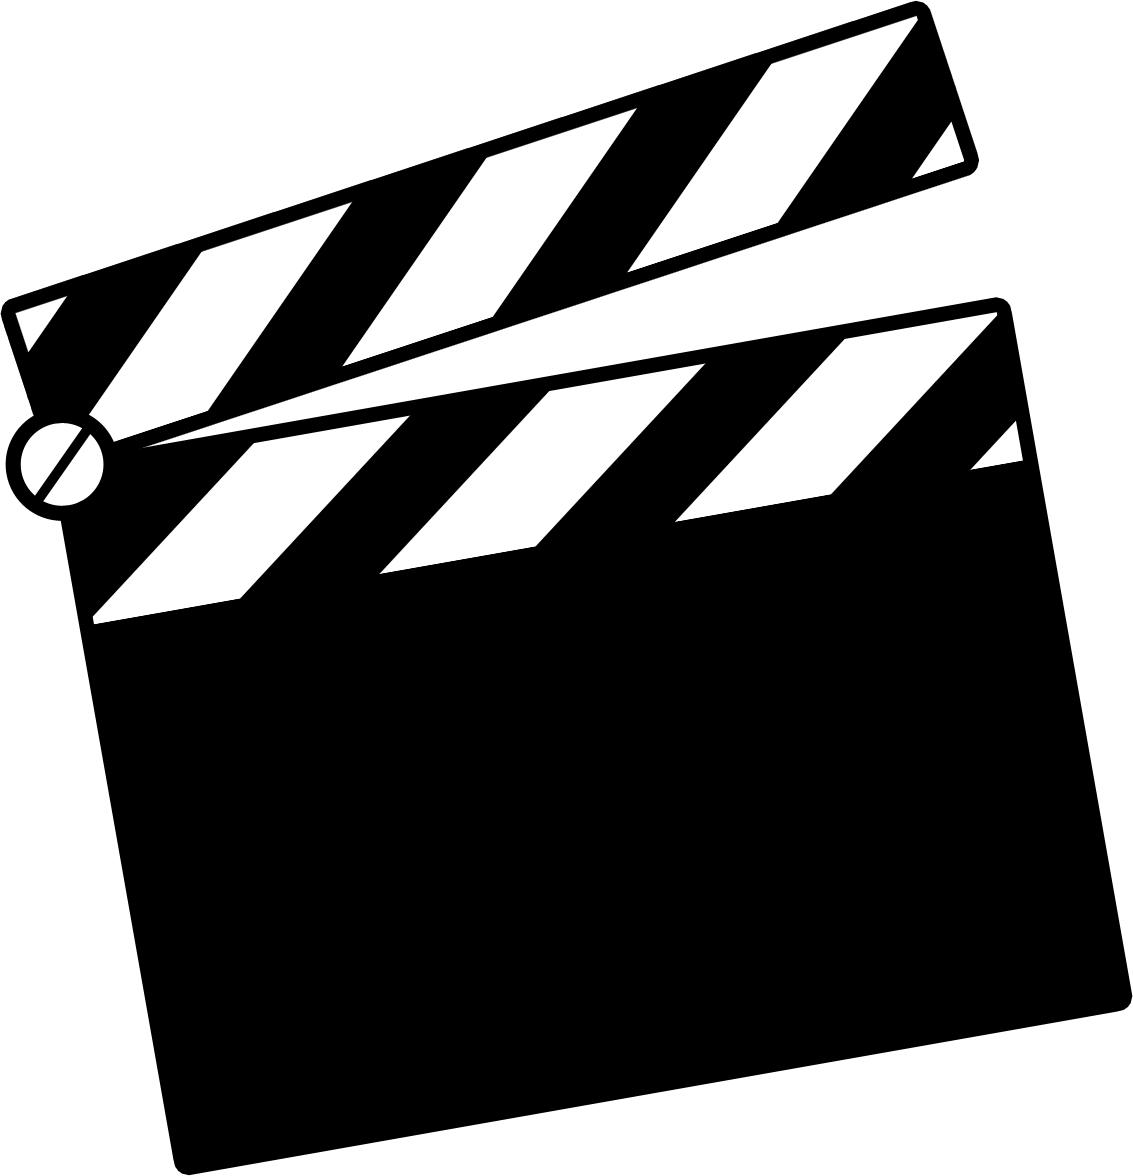 1133x1176 Movie Clapper Clip Art